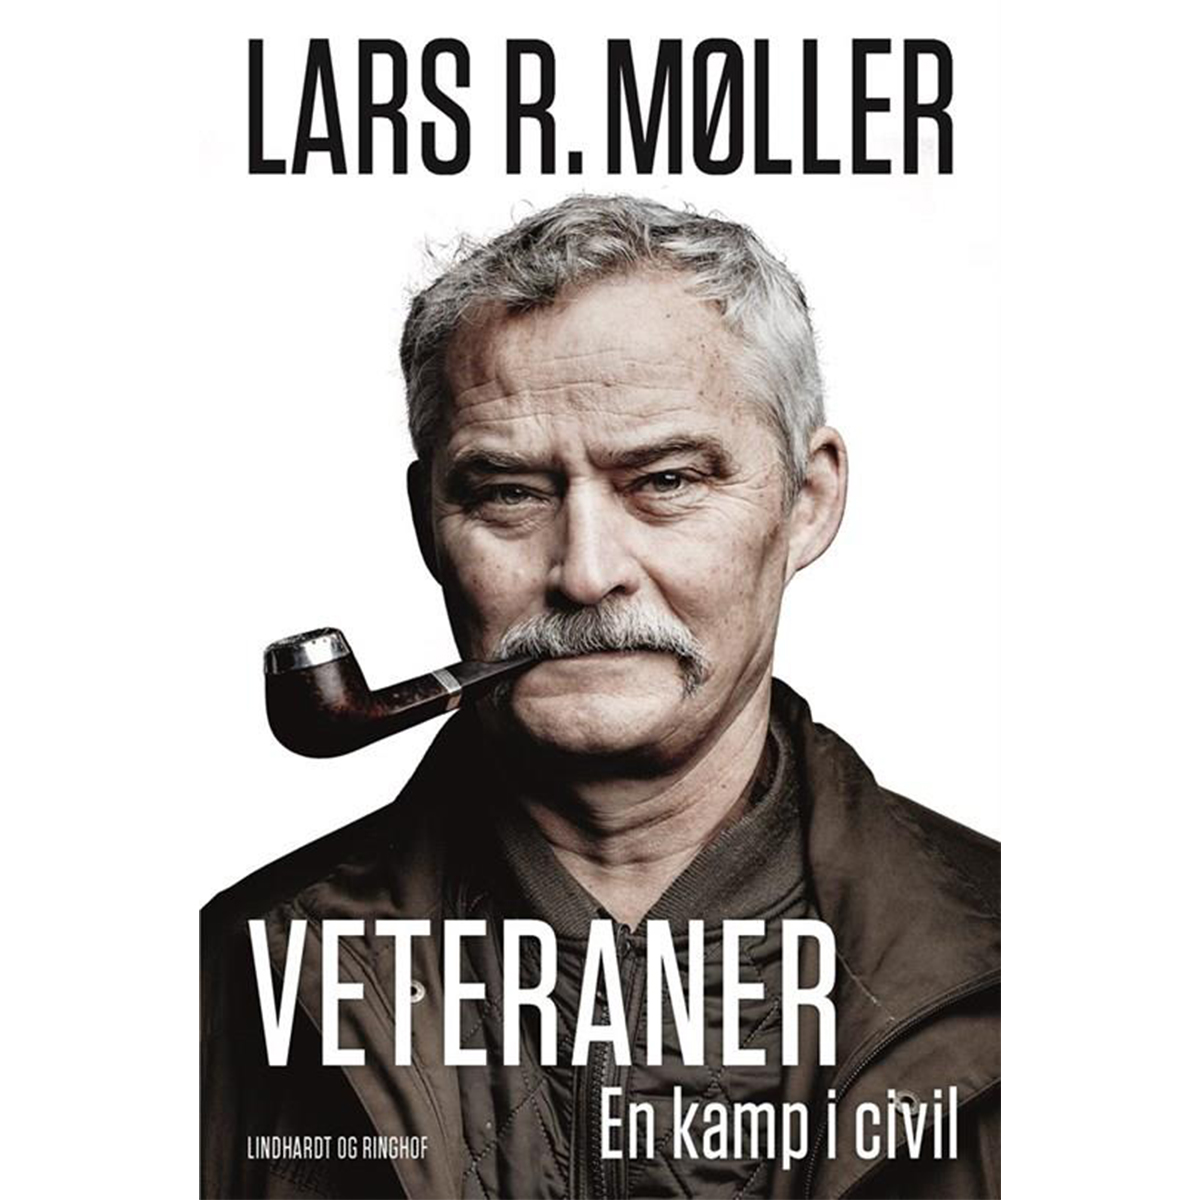 Veteraner - En kamp i civil - Indbundet